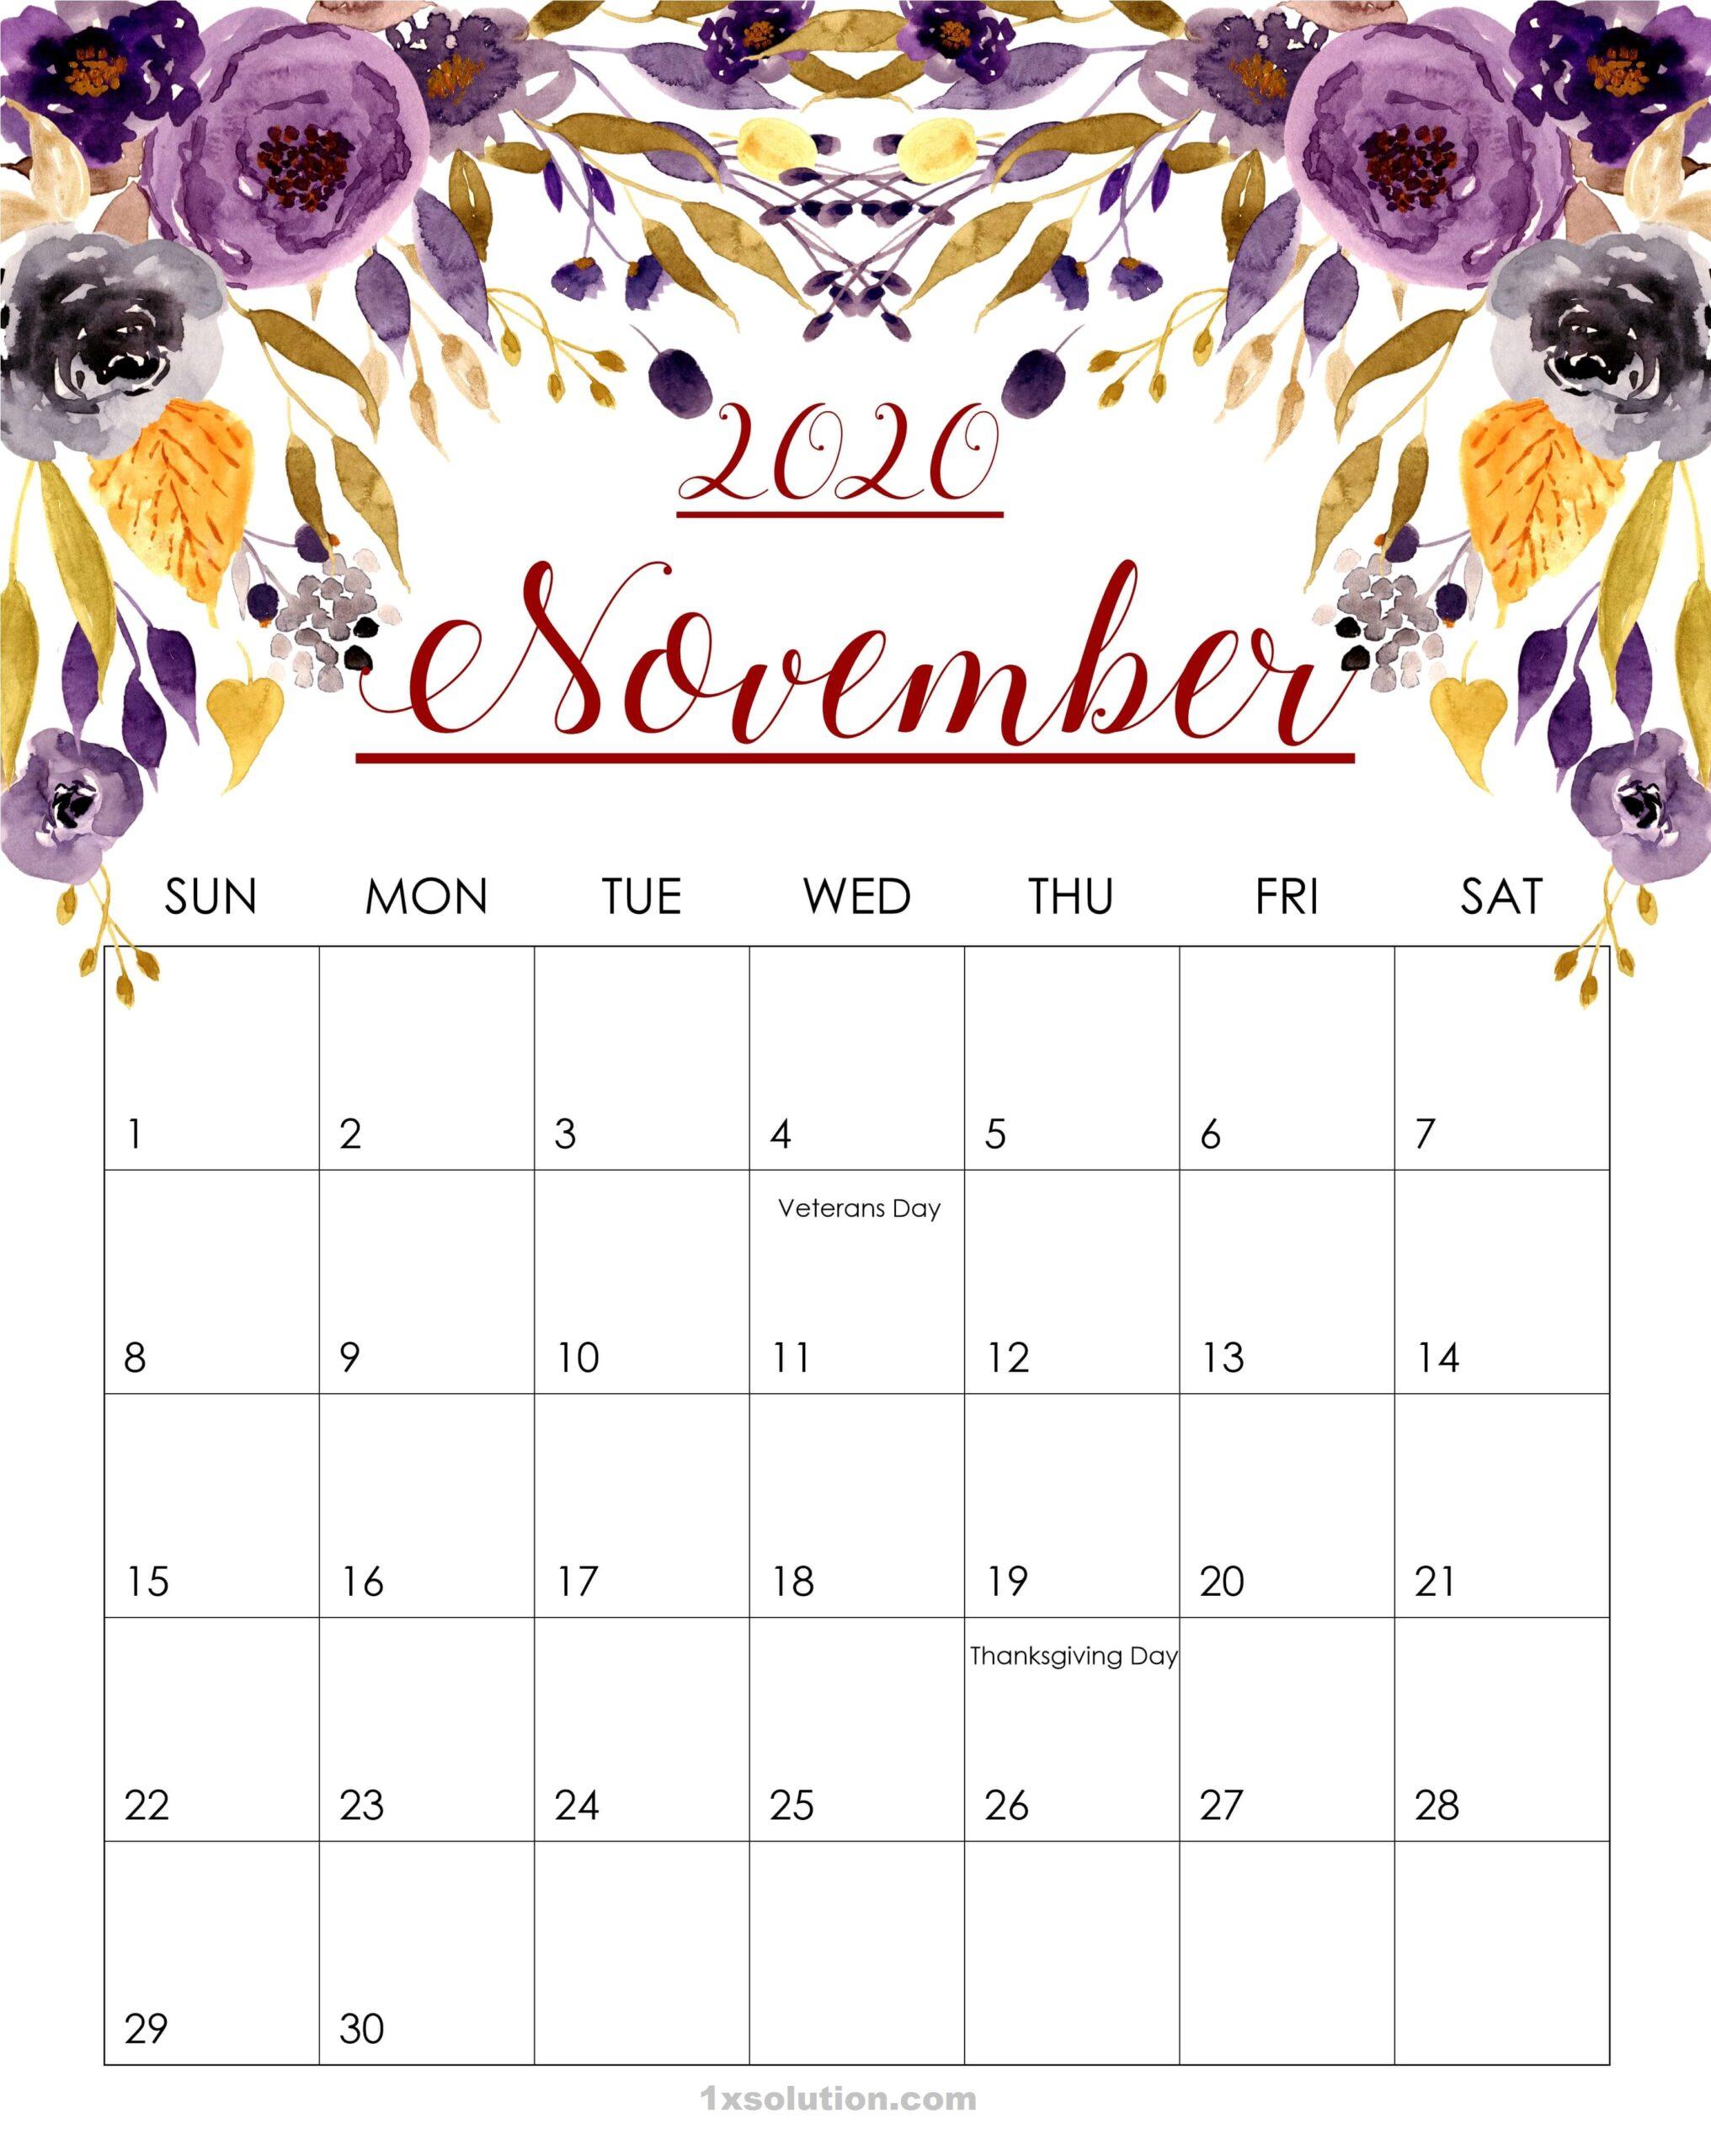 Daily November 2020 Calendar Floral